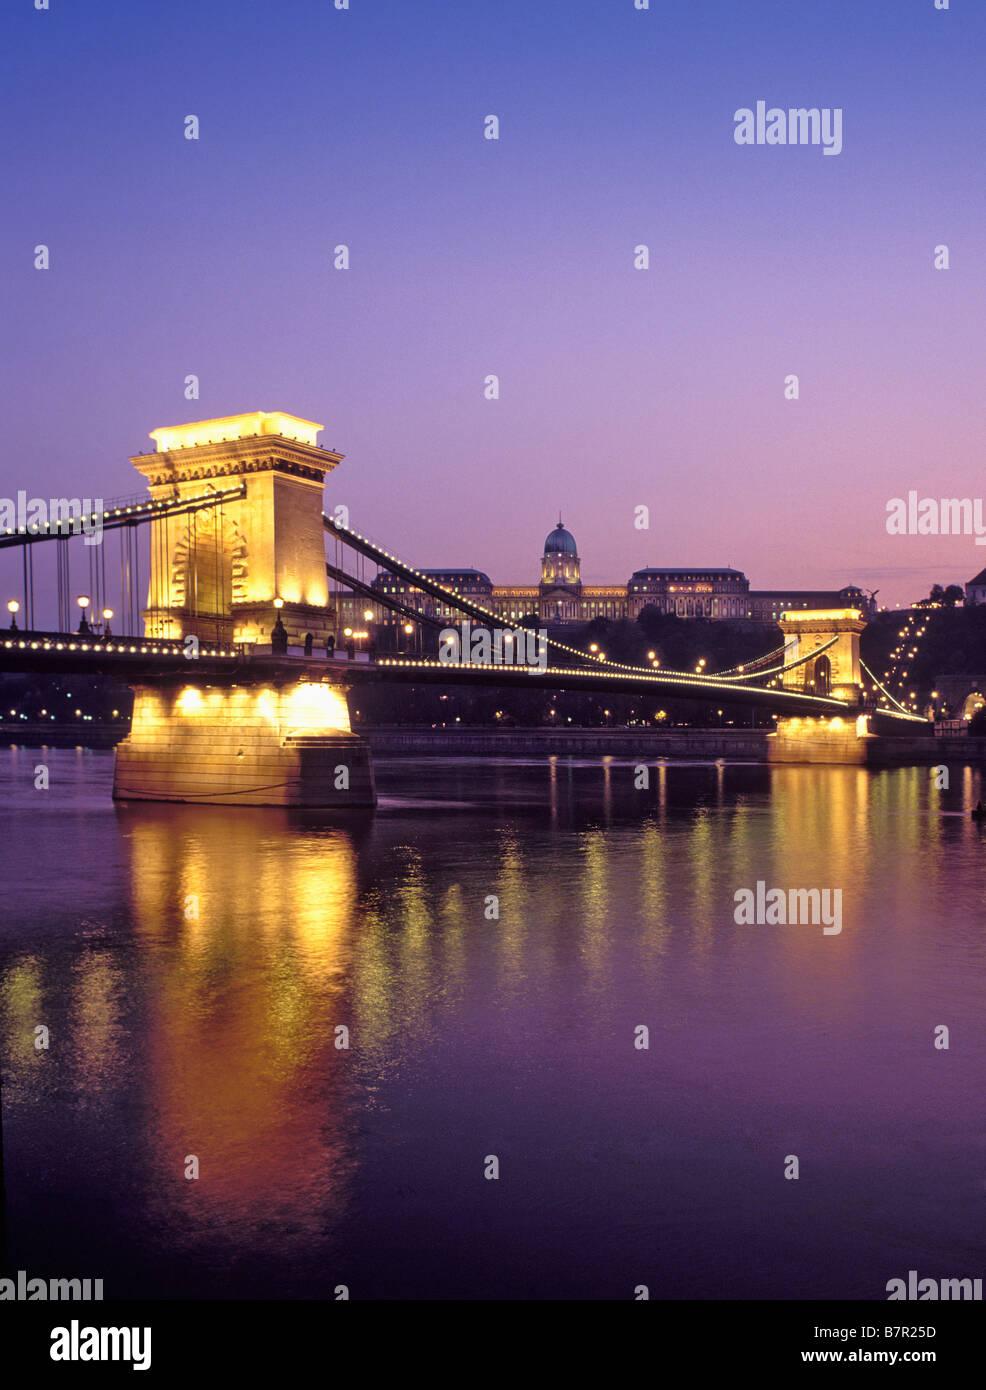 UNGARN-BUDAPEST-KETTENBRÜCKE UND KÖNIGSSCHLOSS Stockbild